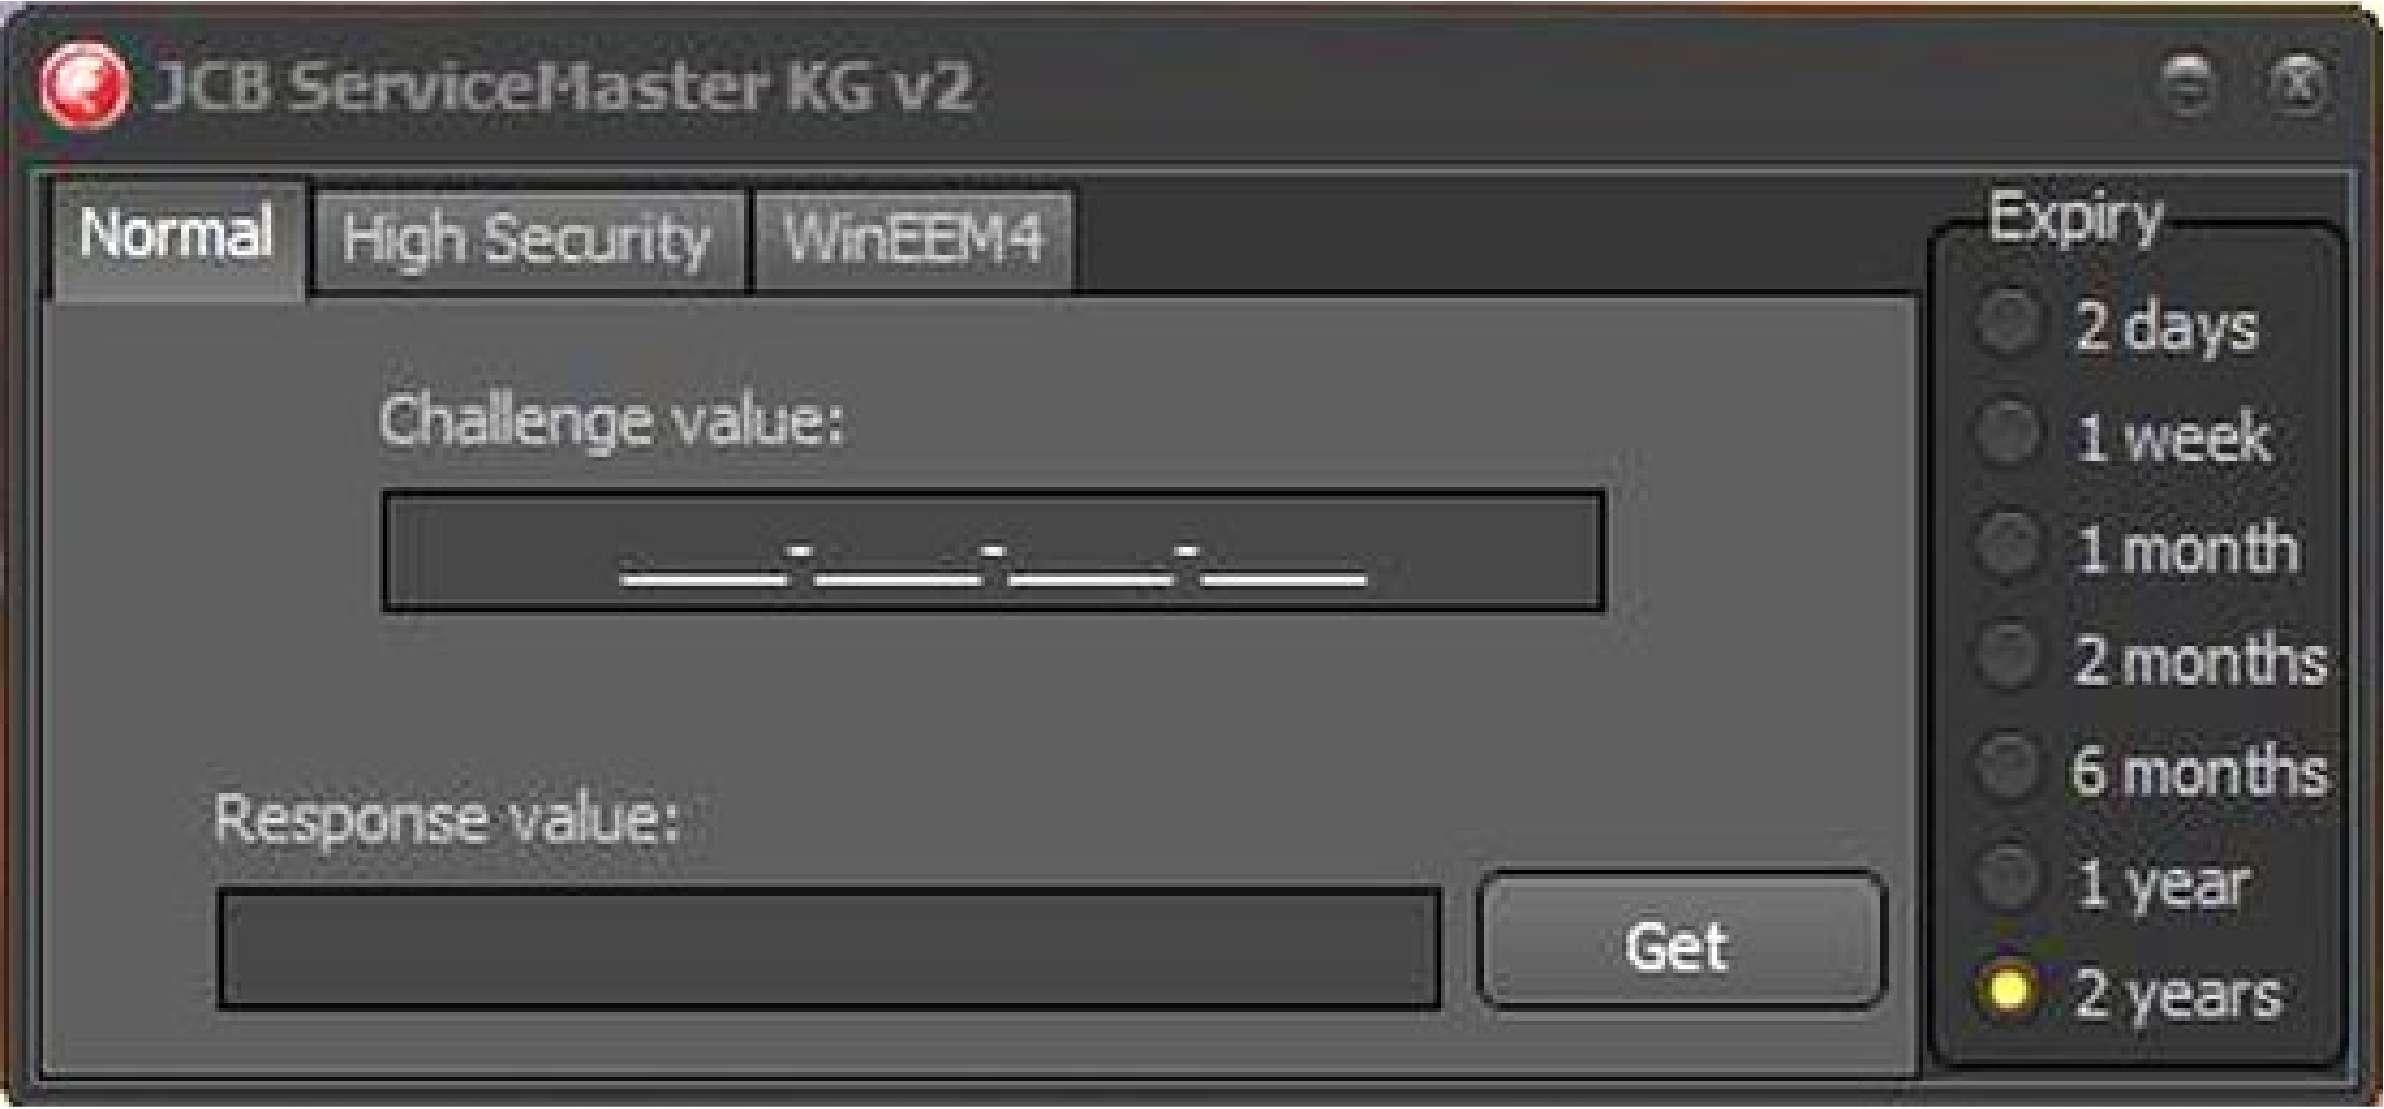 JCB ServiceMaster 4 Diagnostic Full v1.7.7.1 SS-01